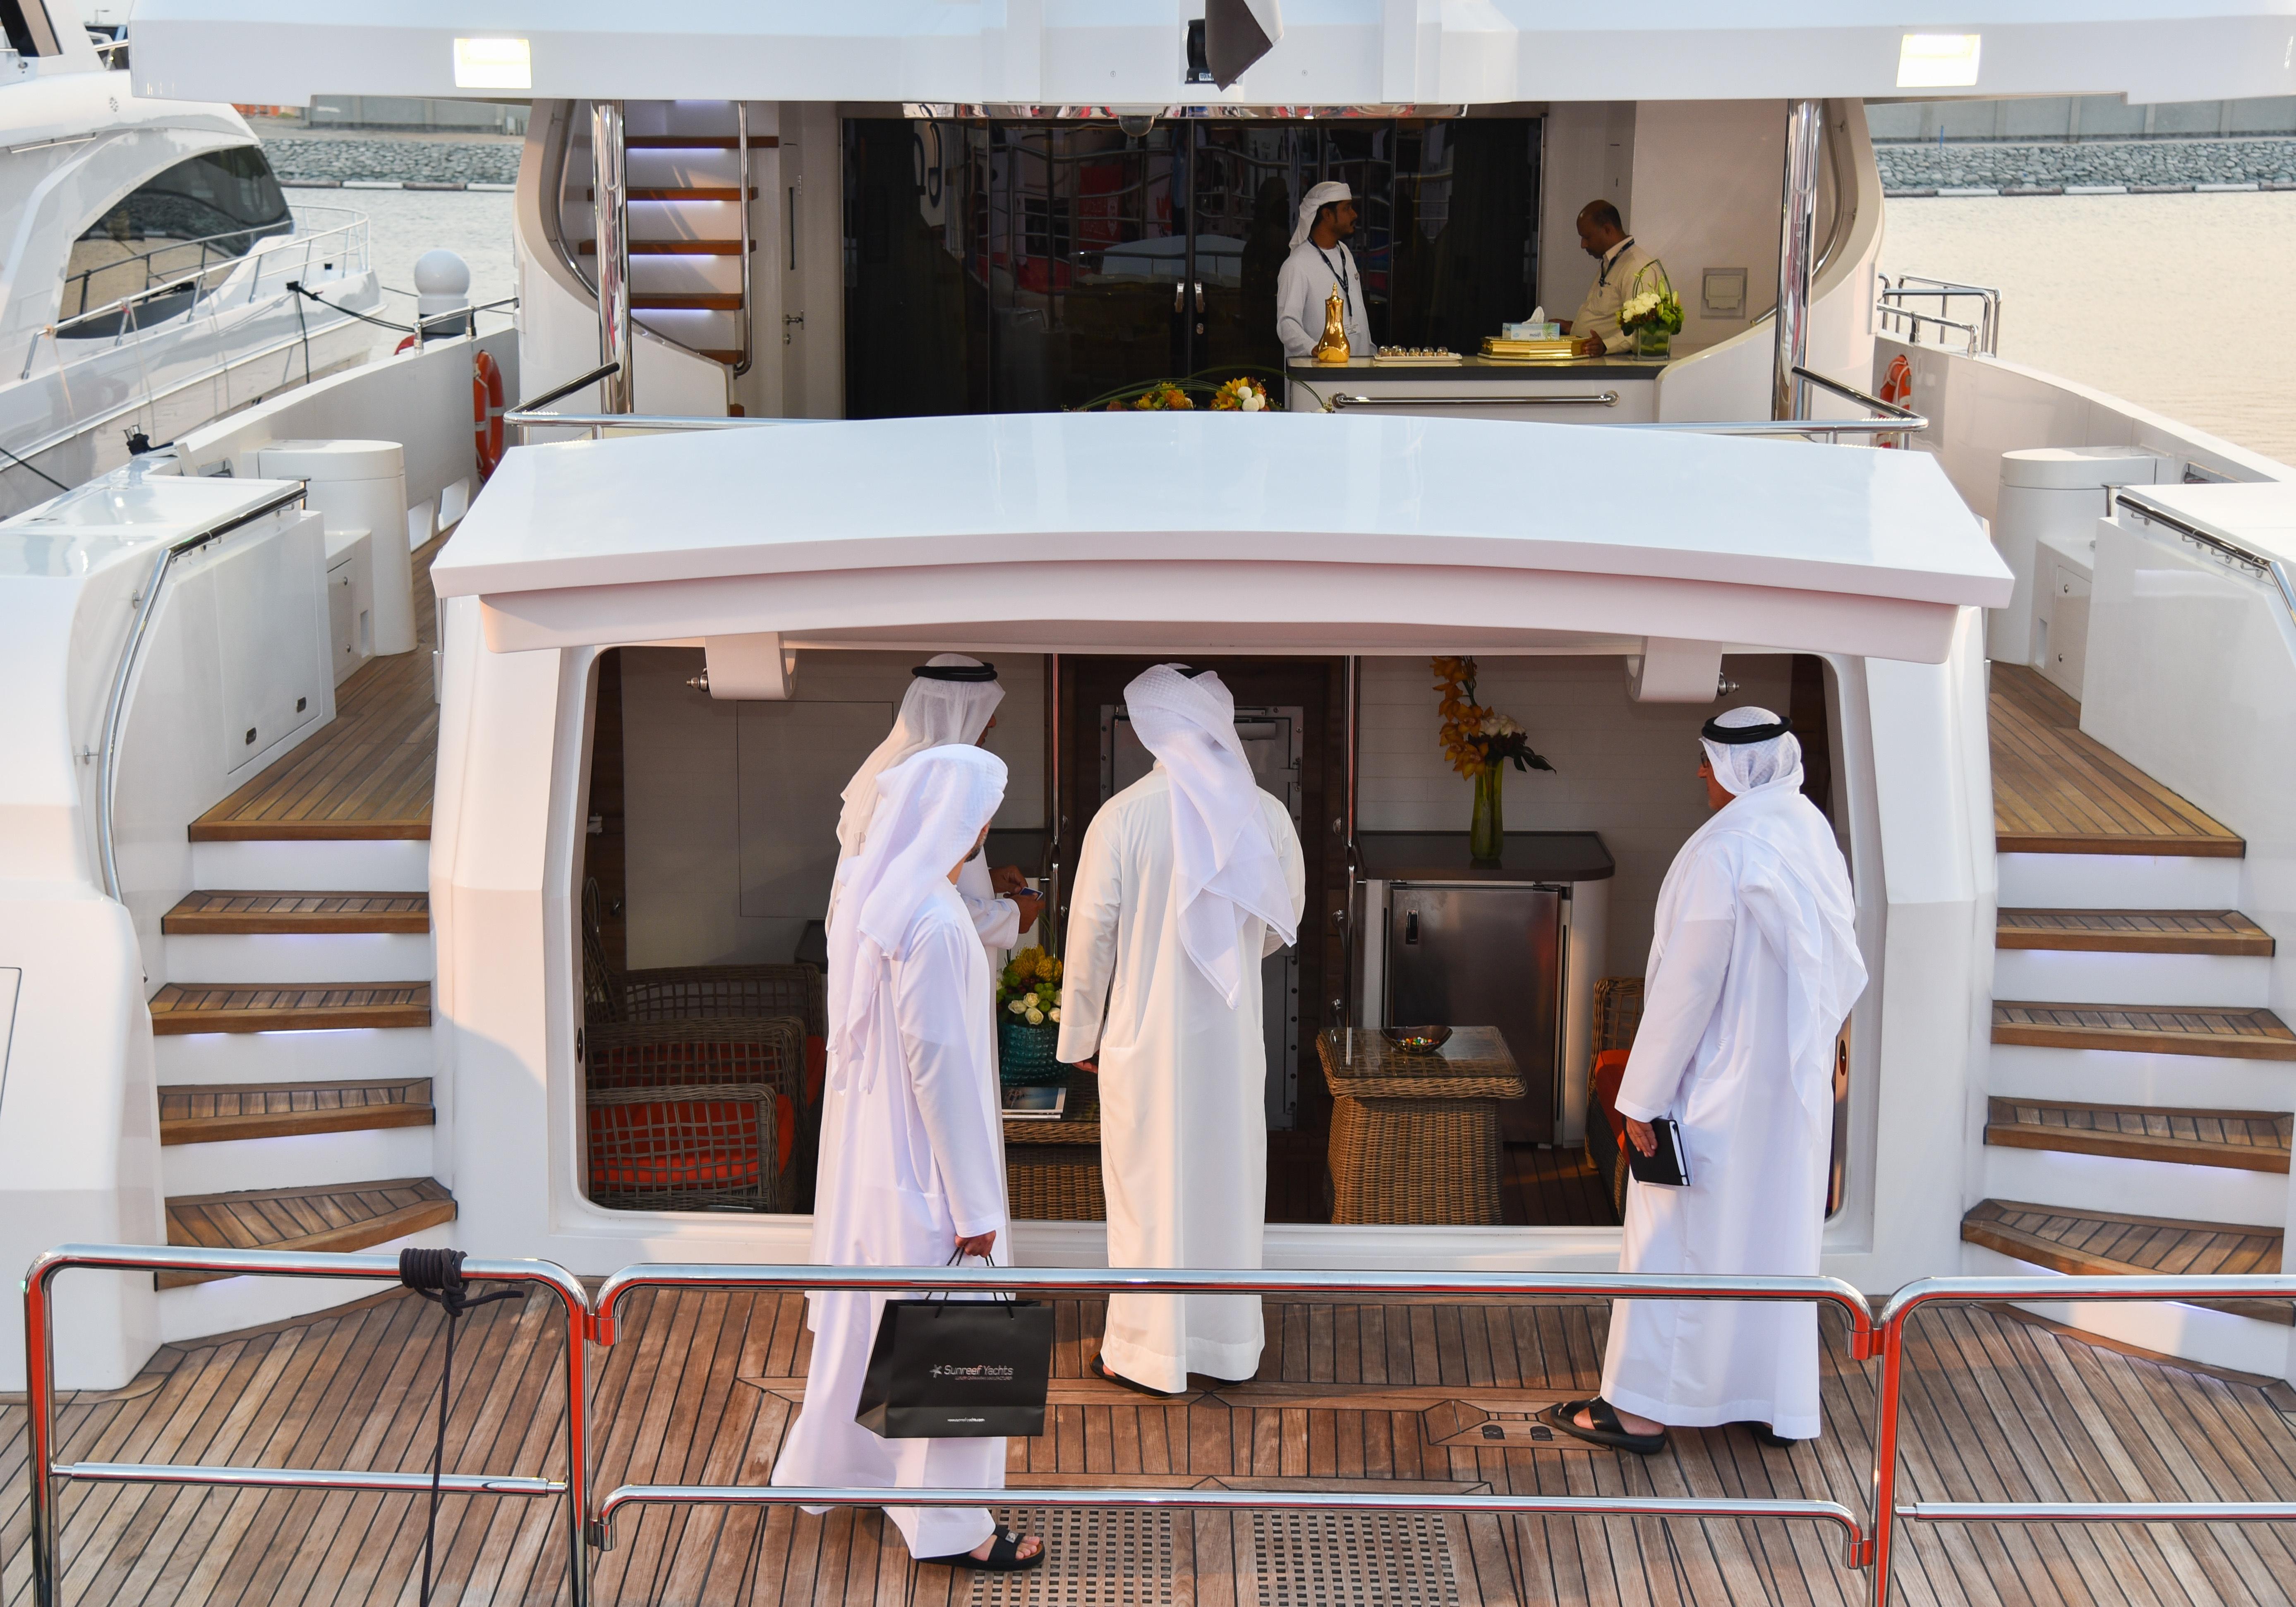 Gulf Craft at Abu Dhabi Boat Show 2018 Day 3 (24).jpg